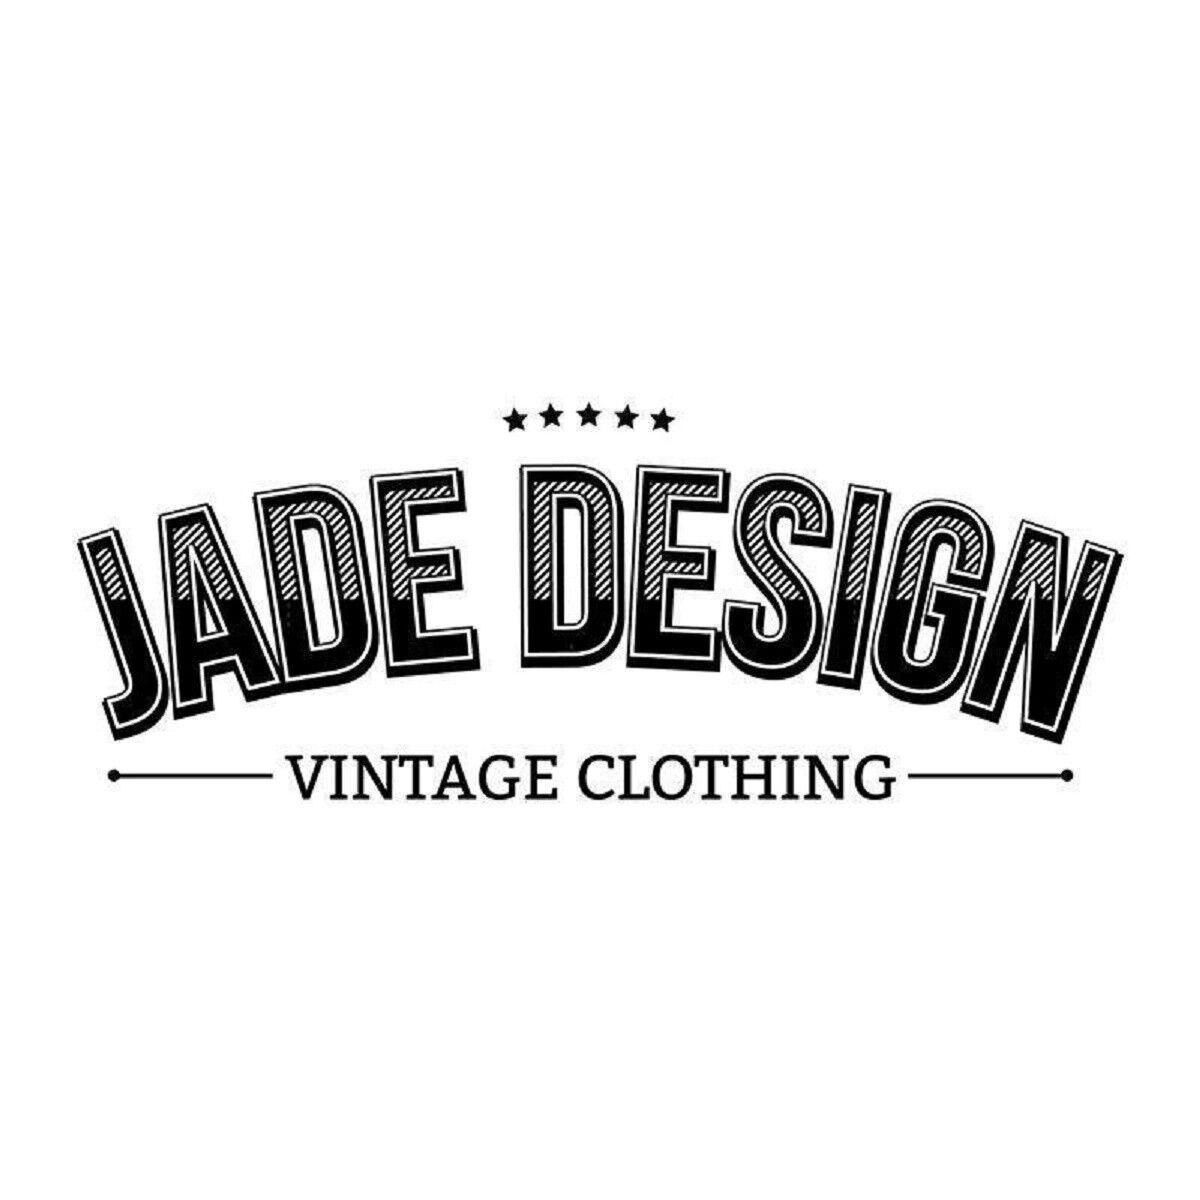 Jade Design Vintage Clothing